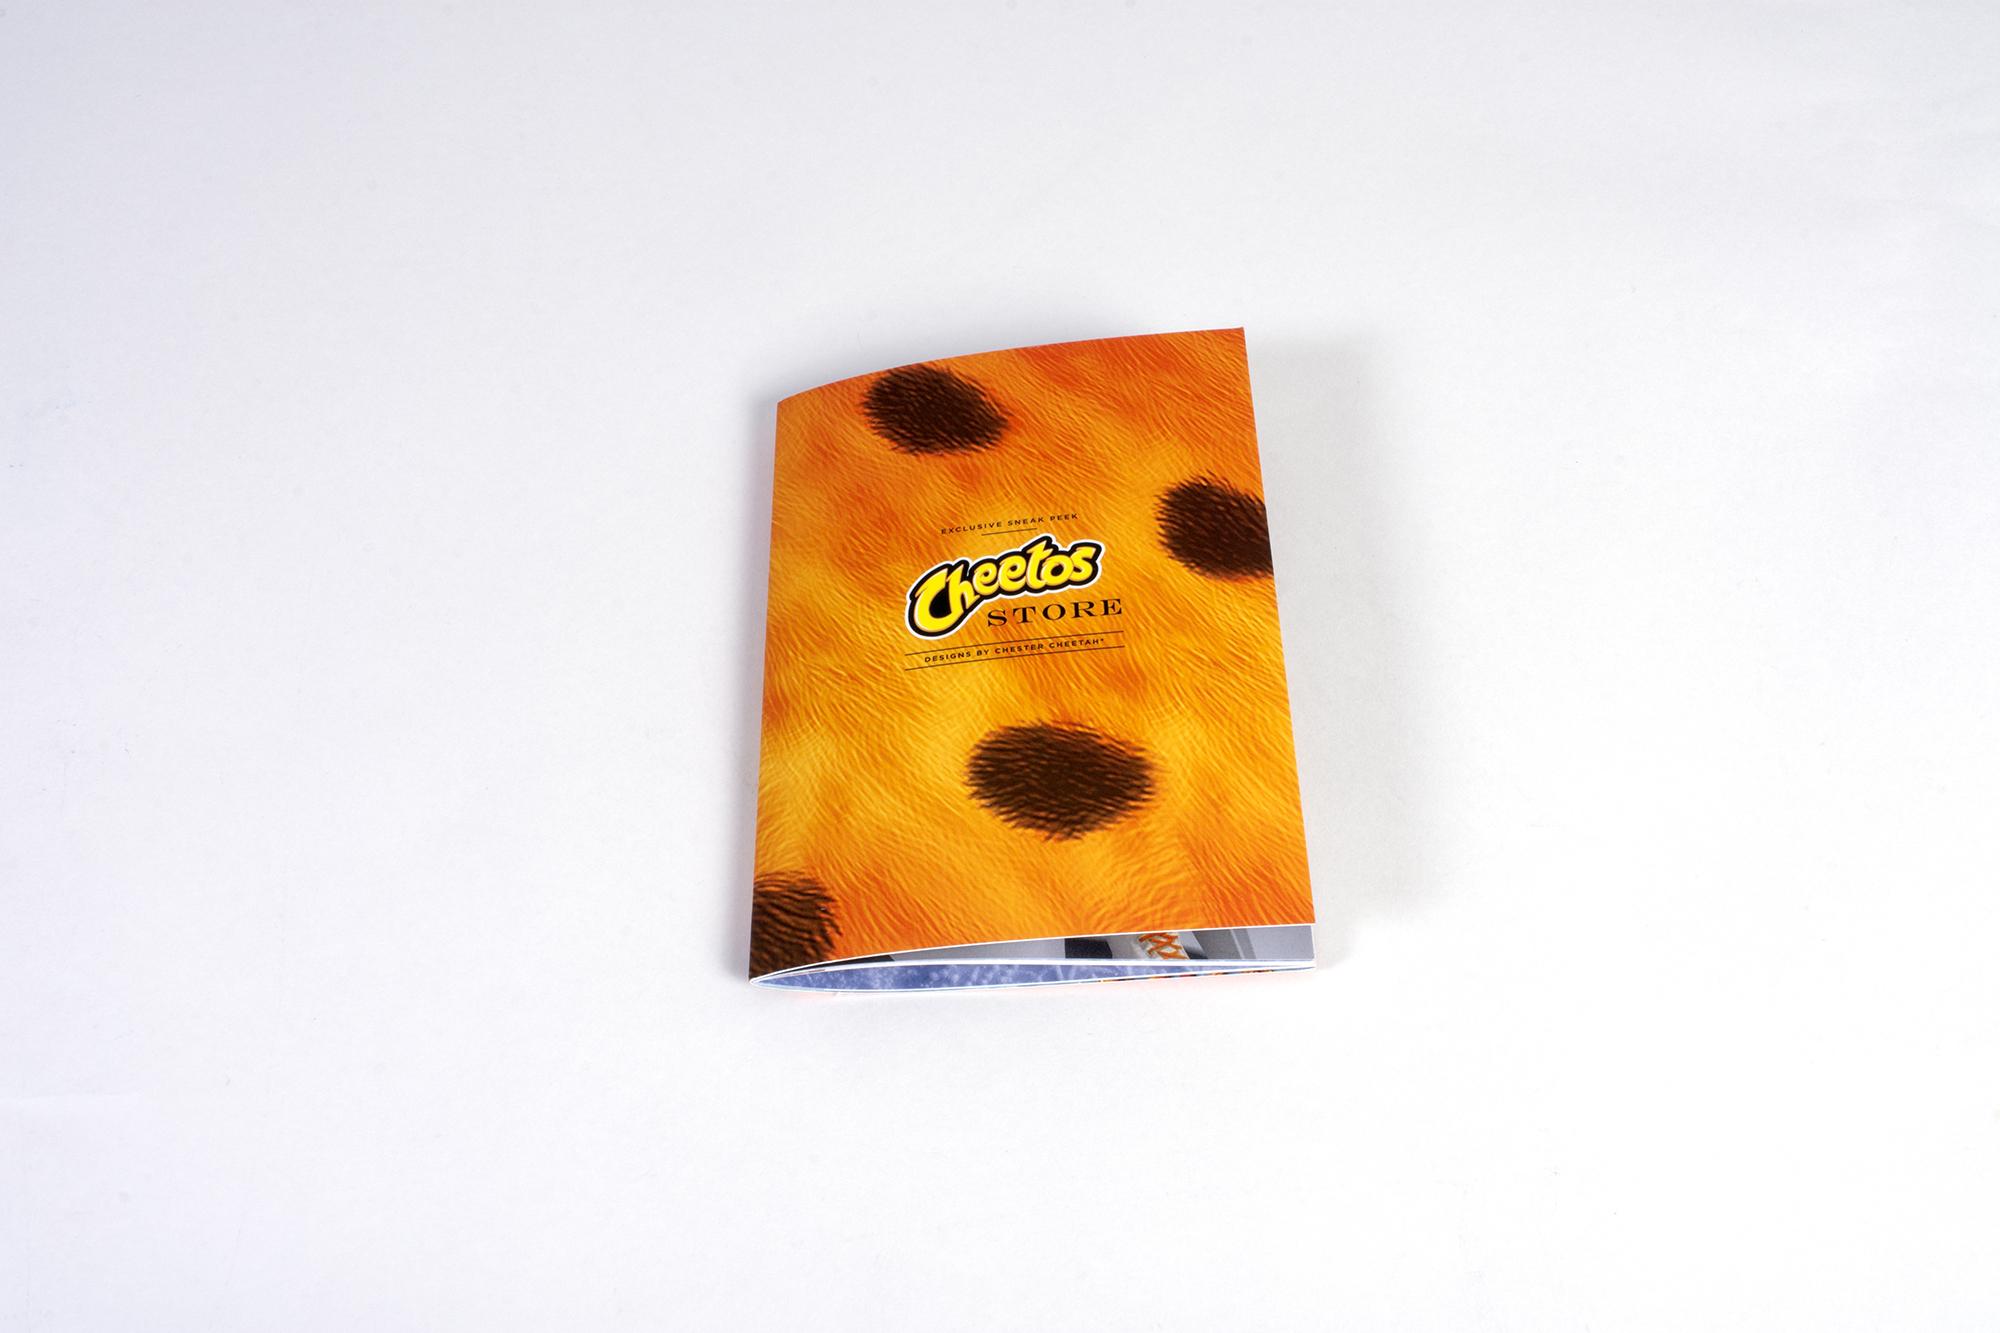 Cheetos_Store_1.jpg